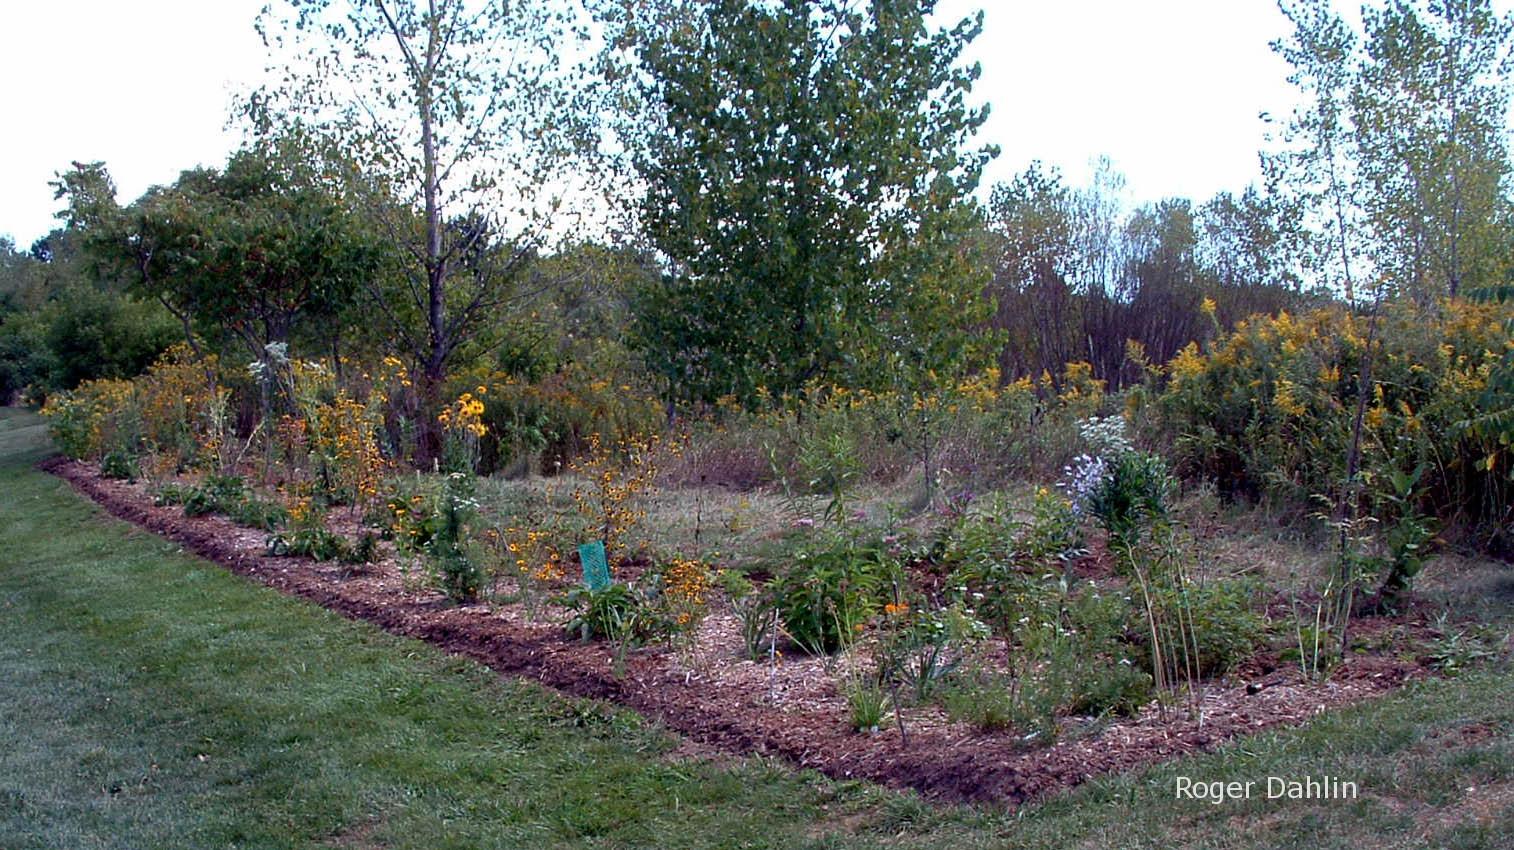 Nodding Onion Gardens: Retirement Community